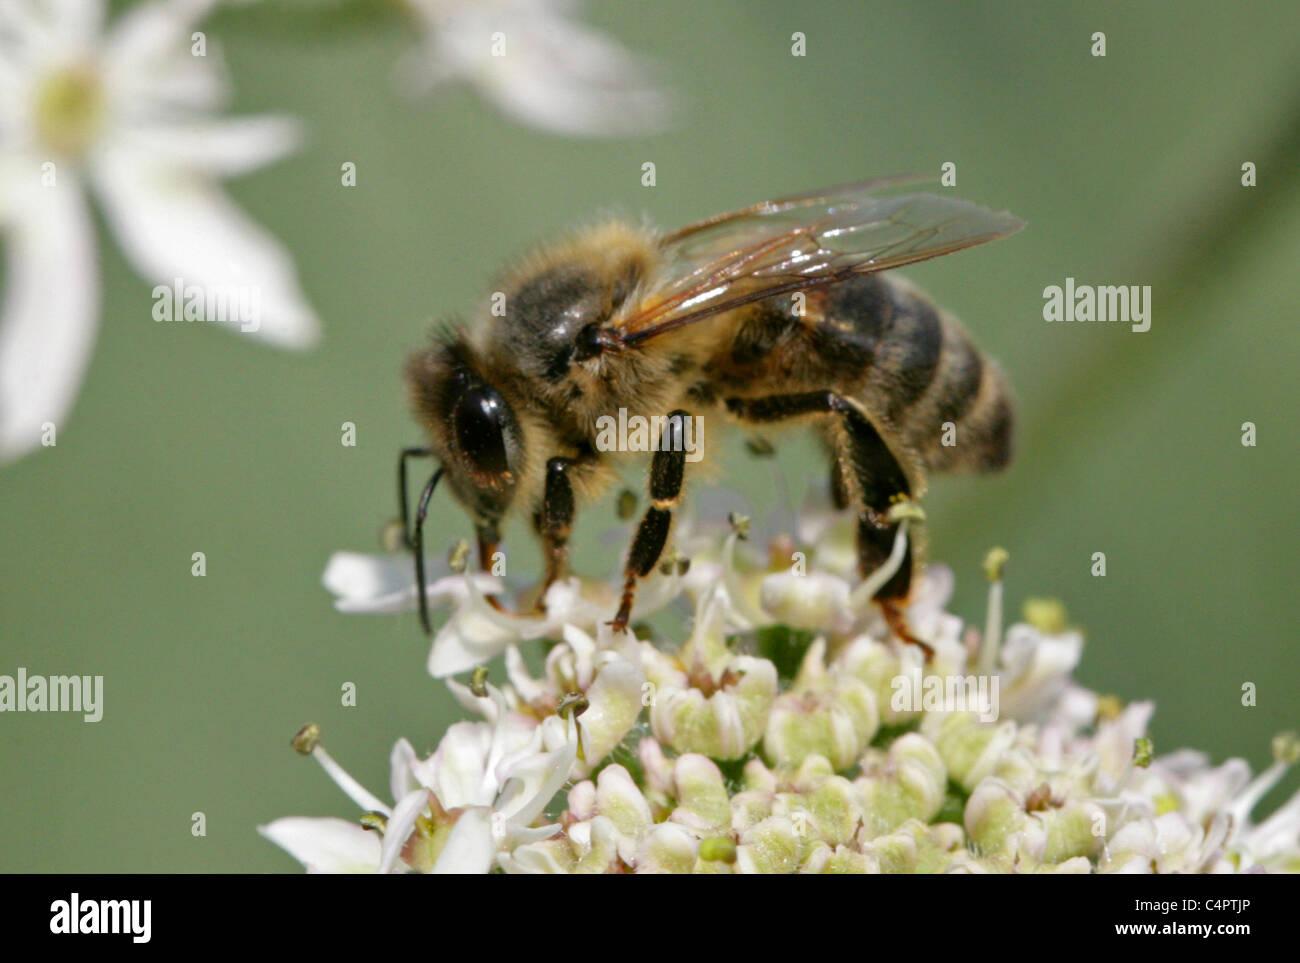 European or Western Honey Bee, Apis mellifera, Apinae, Apidae, Apocrita, Hymenoptera syn Apis mellifica - Stock Image